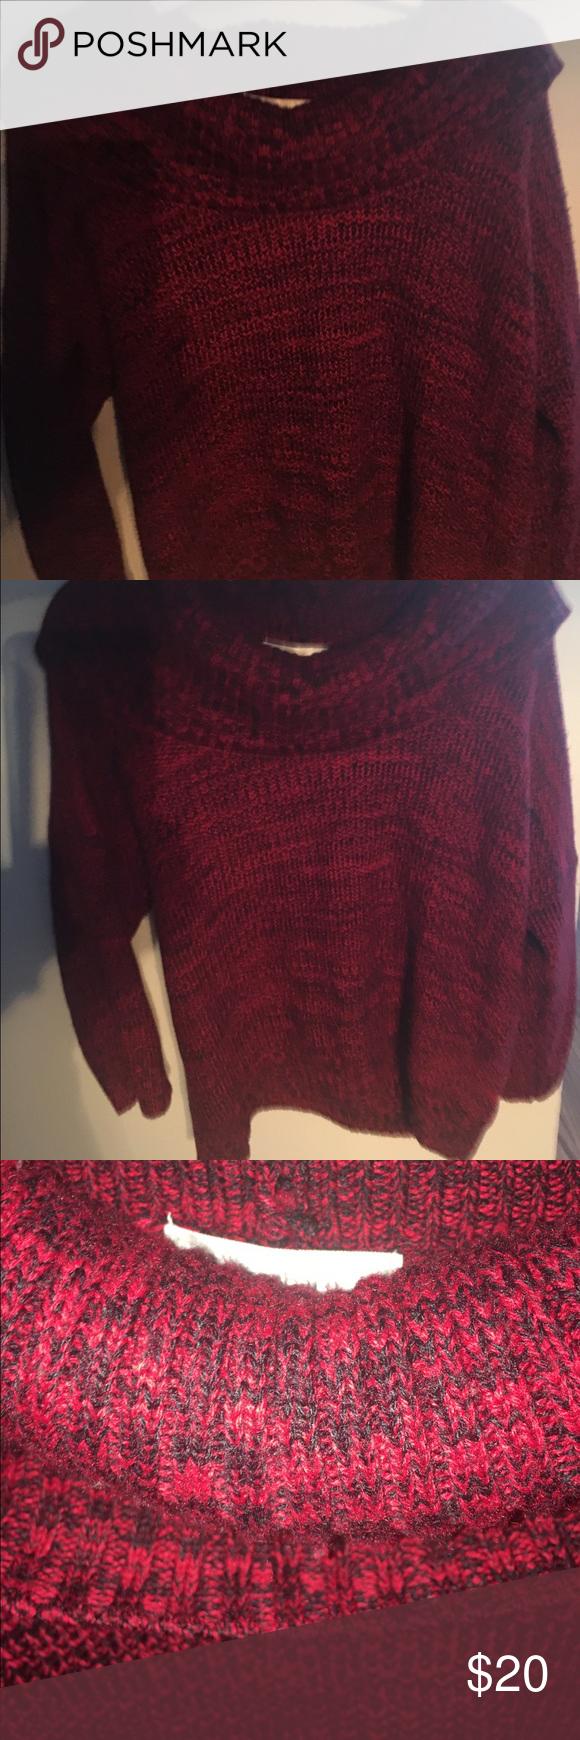 Dress Barn Red & Black Sweater | Red black